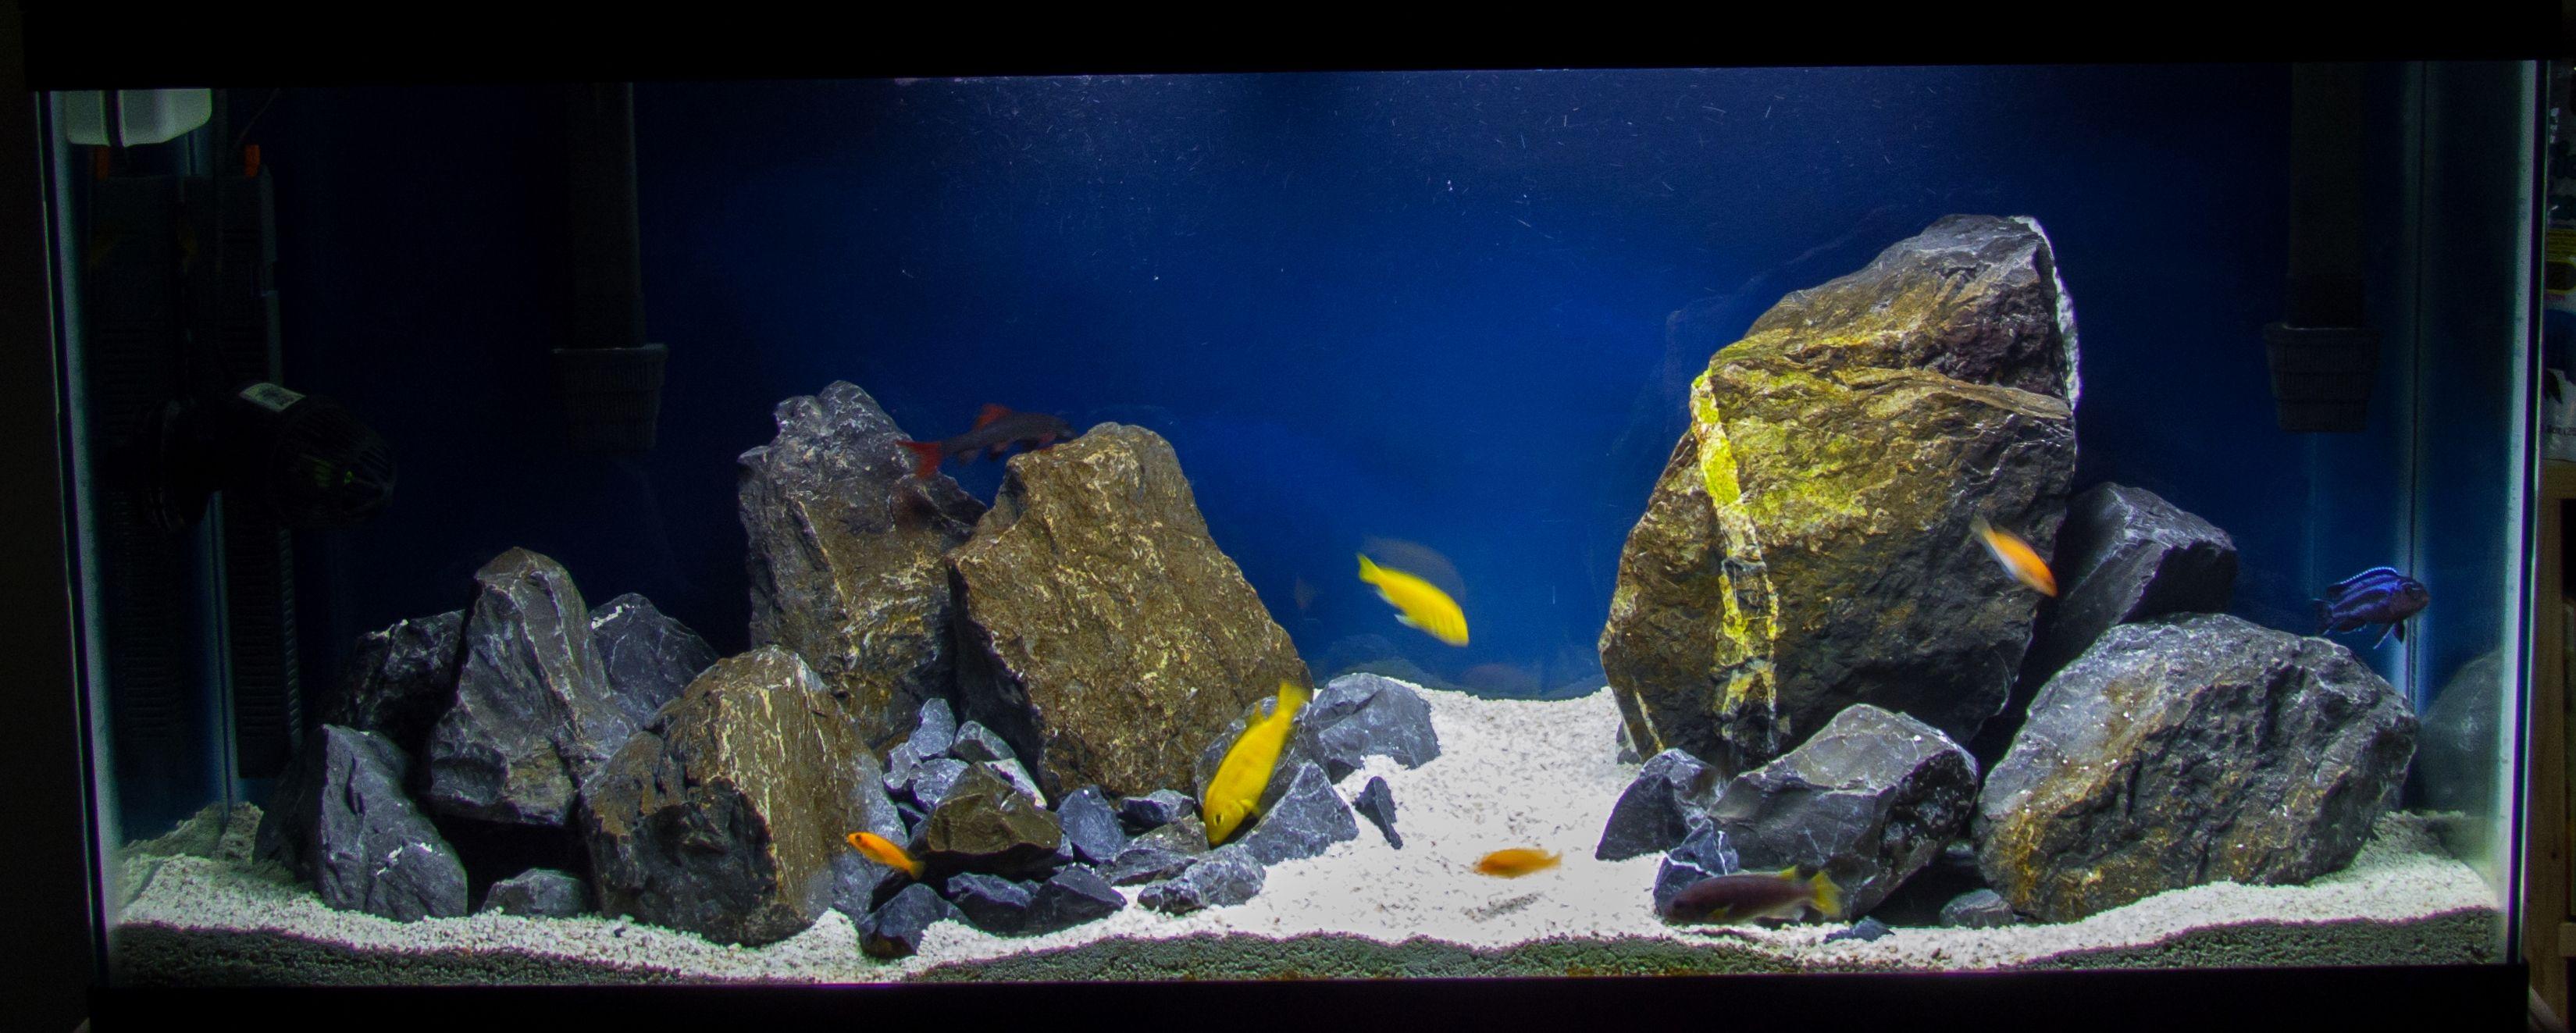 Aquascape Ideas Aquascaping African Cichlid Aquarium